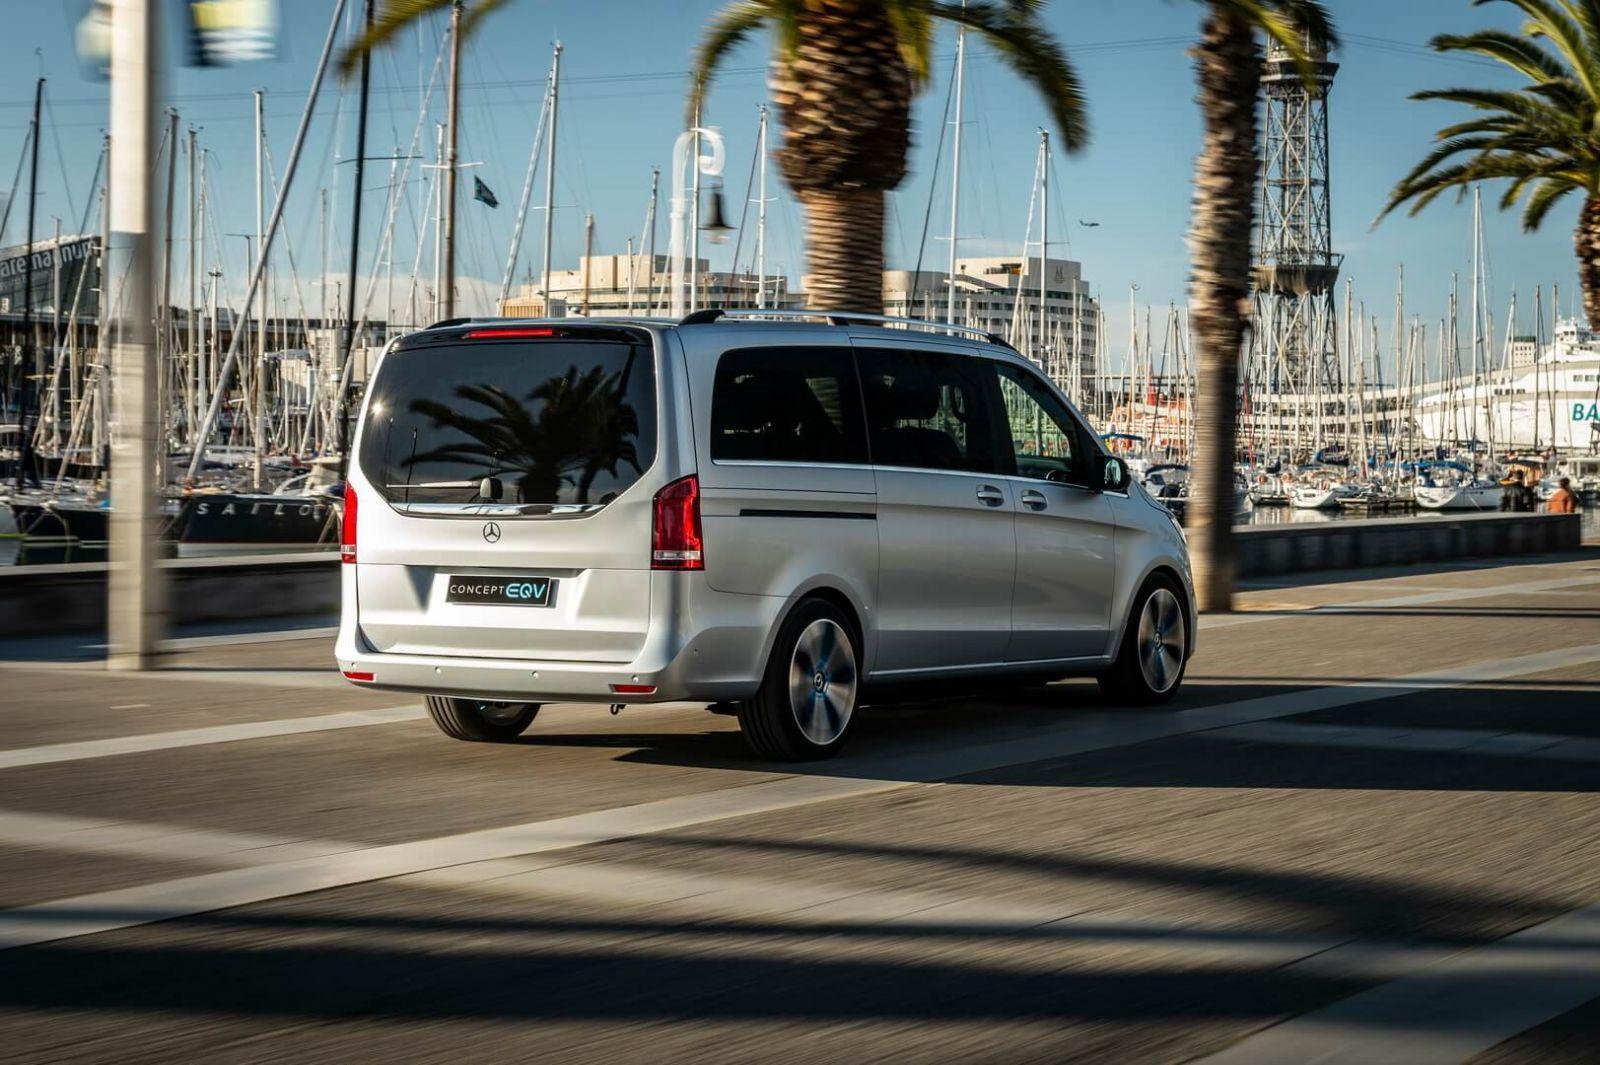 Mercedes-Benz представил минивэн EQV с электрическим двигателем (6)